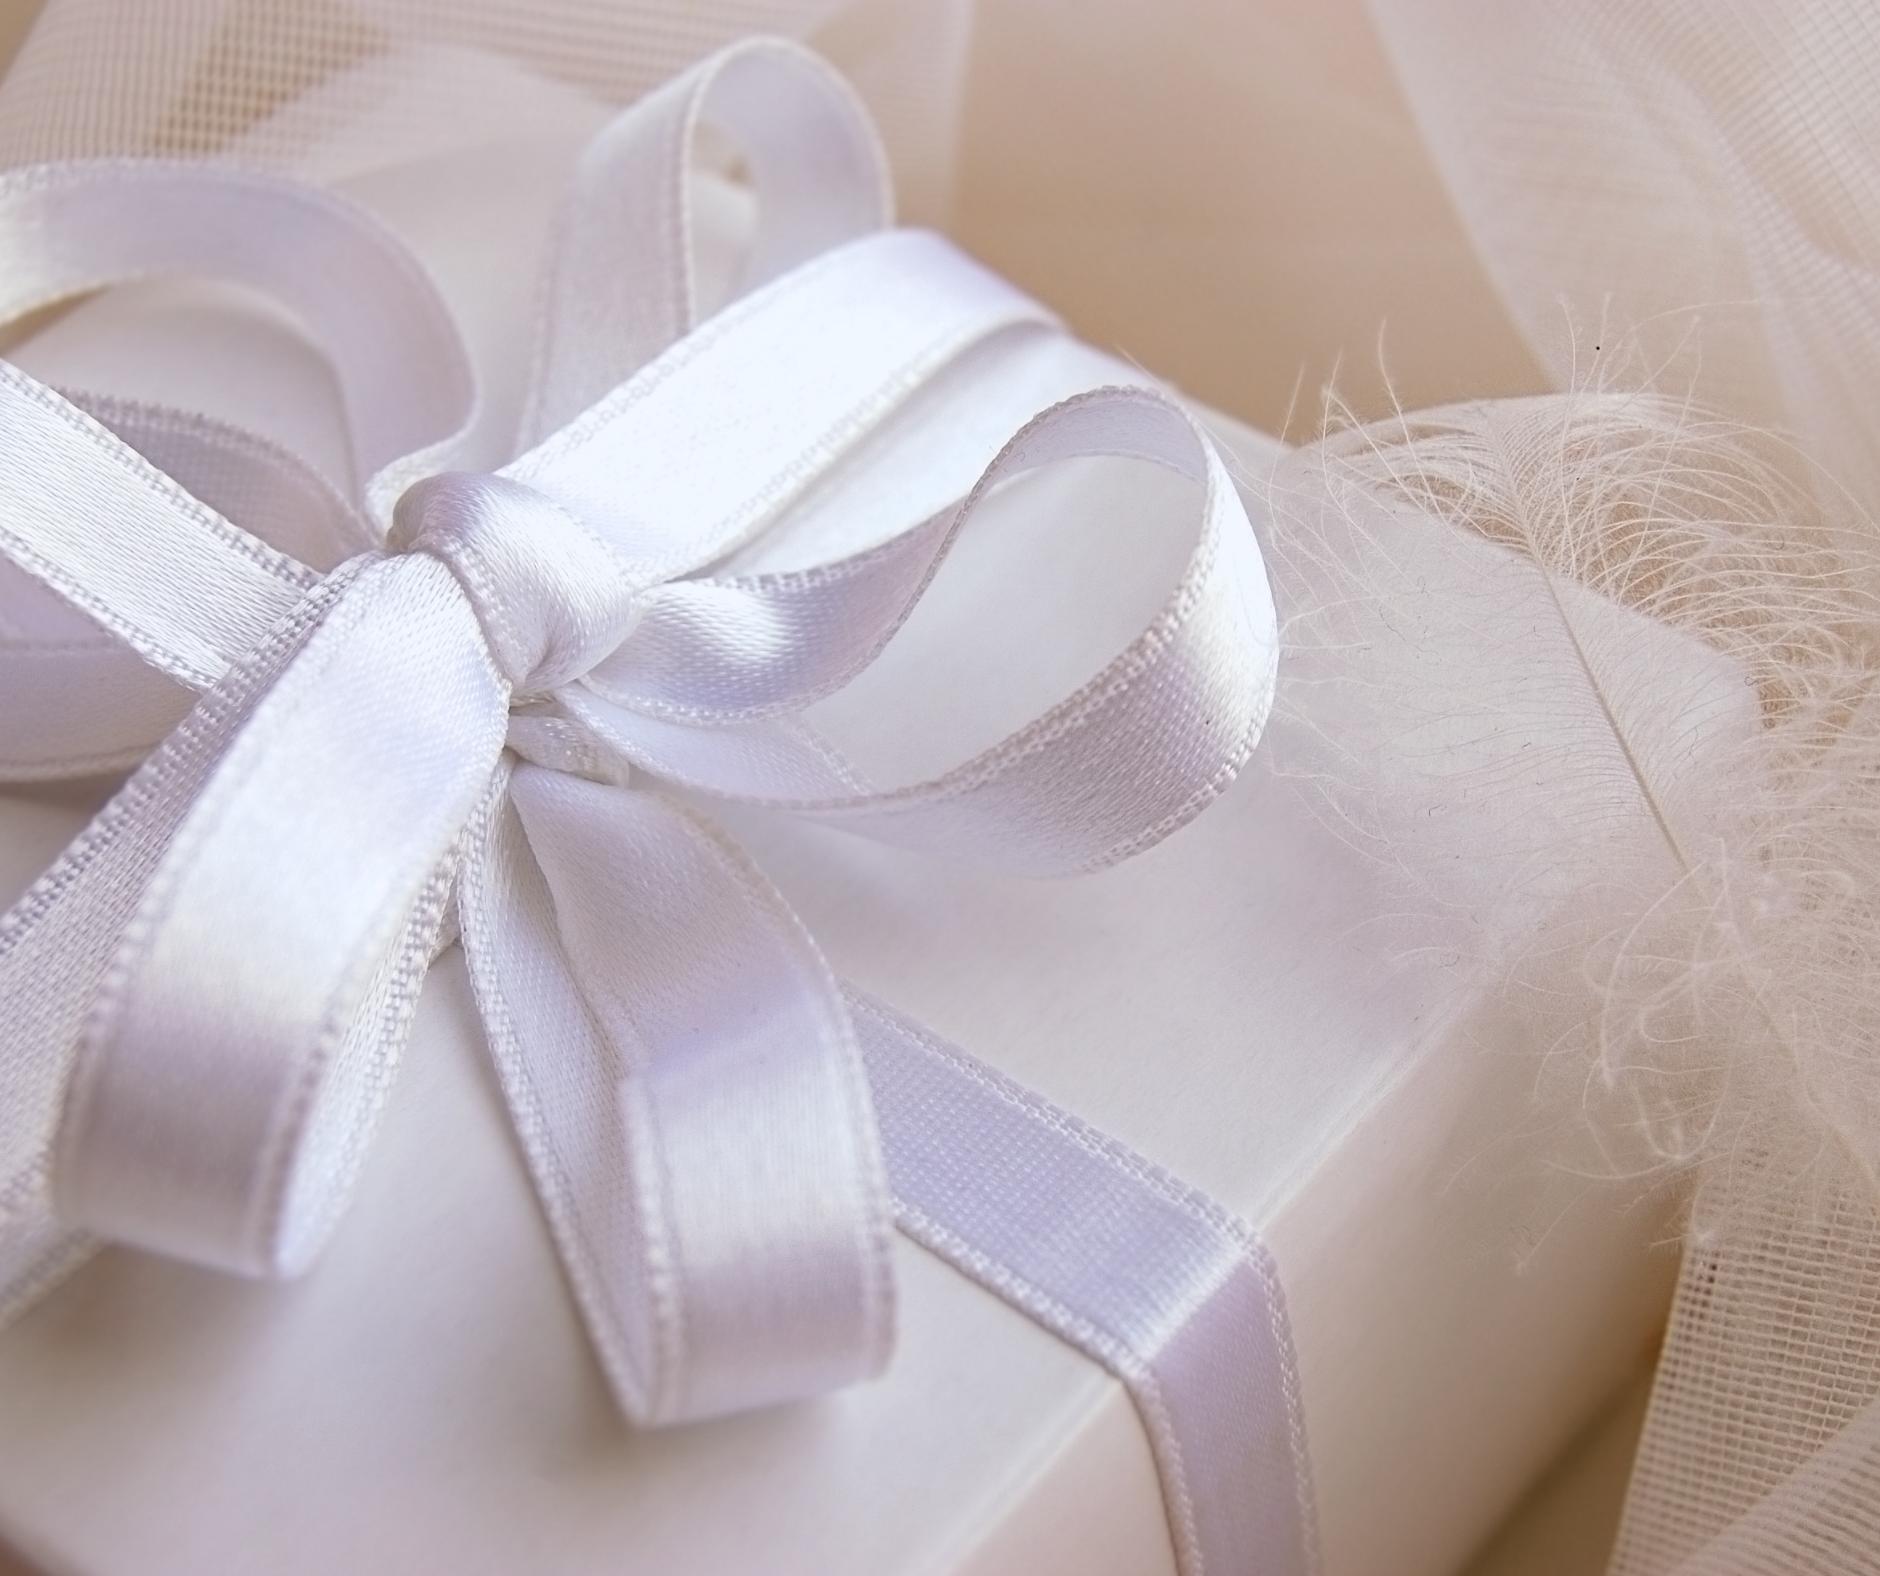 Matrimonio Senza Bomboniere.La Bomboniera Per Il Matrimonio Radicchio Tardivo Cipolle